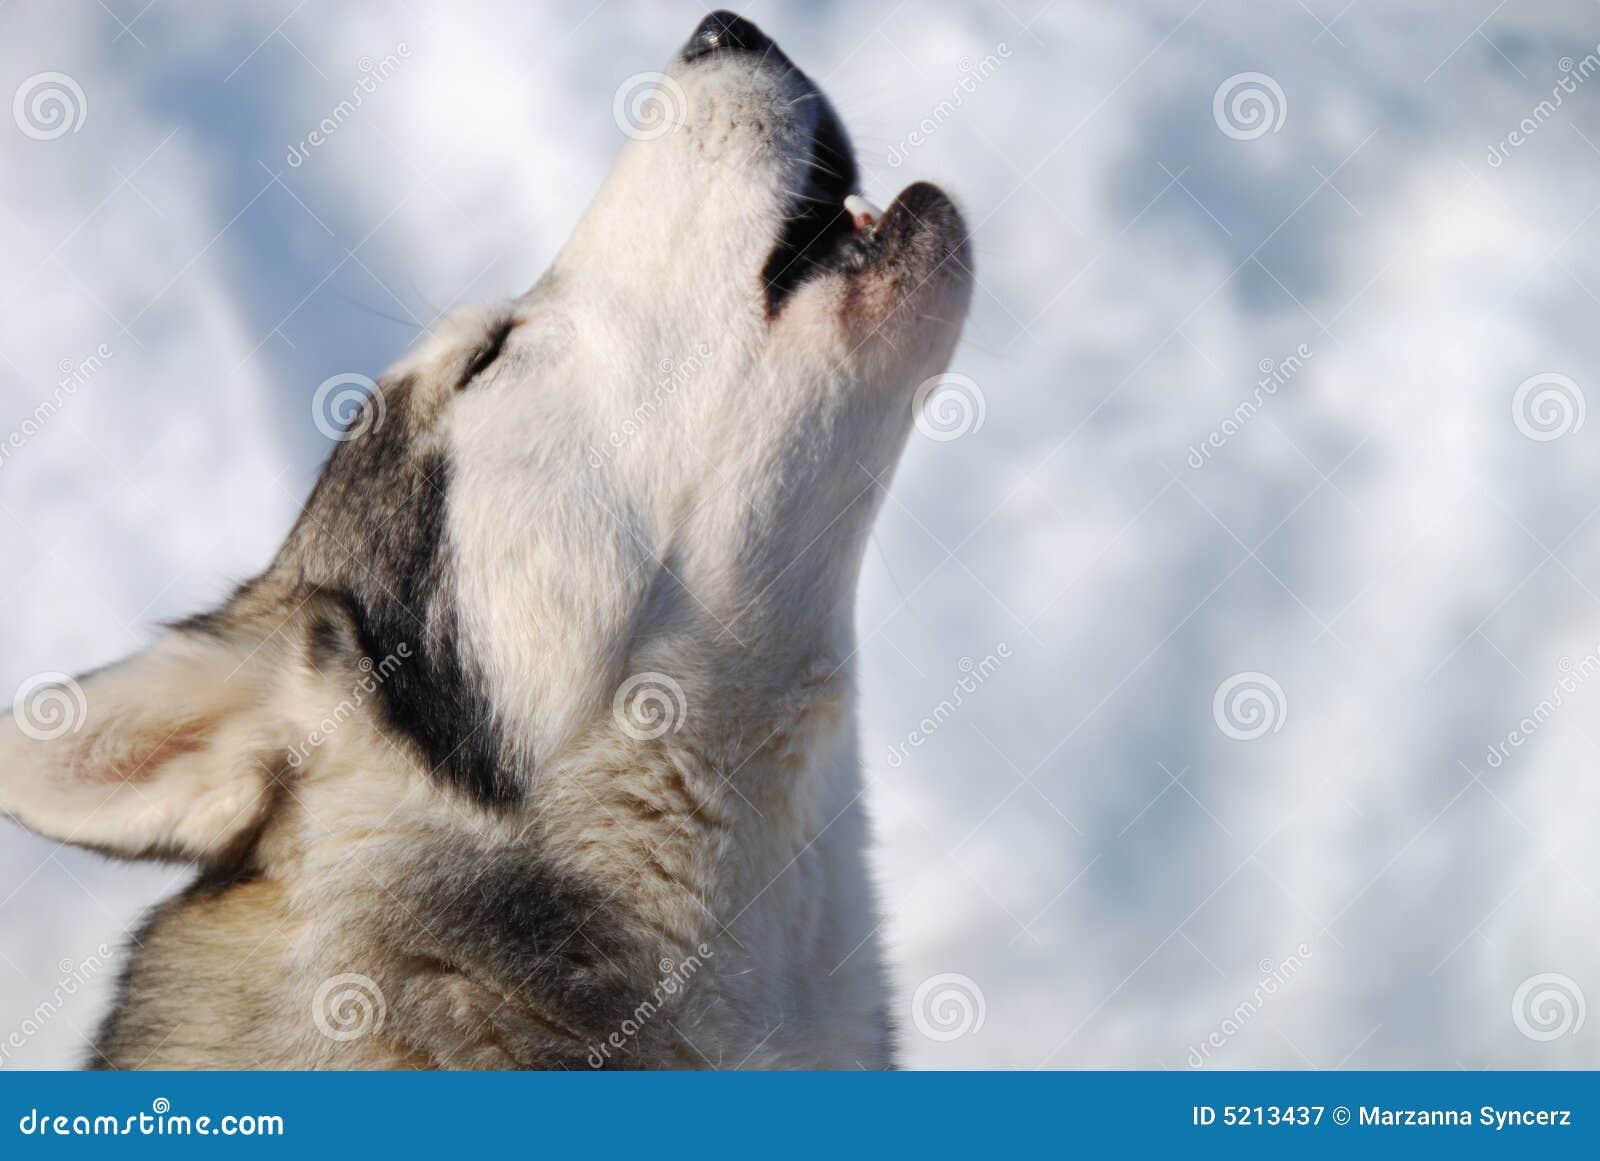 Lobo do urro